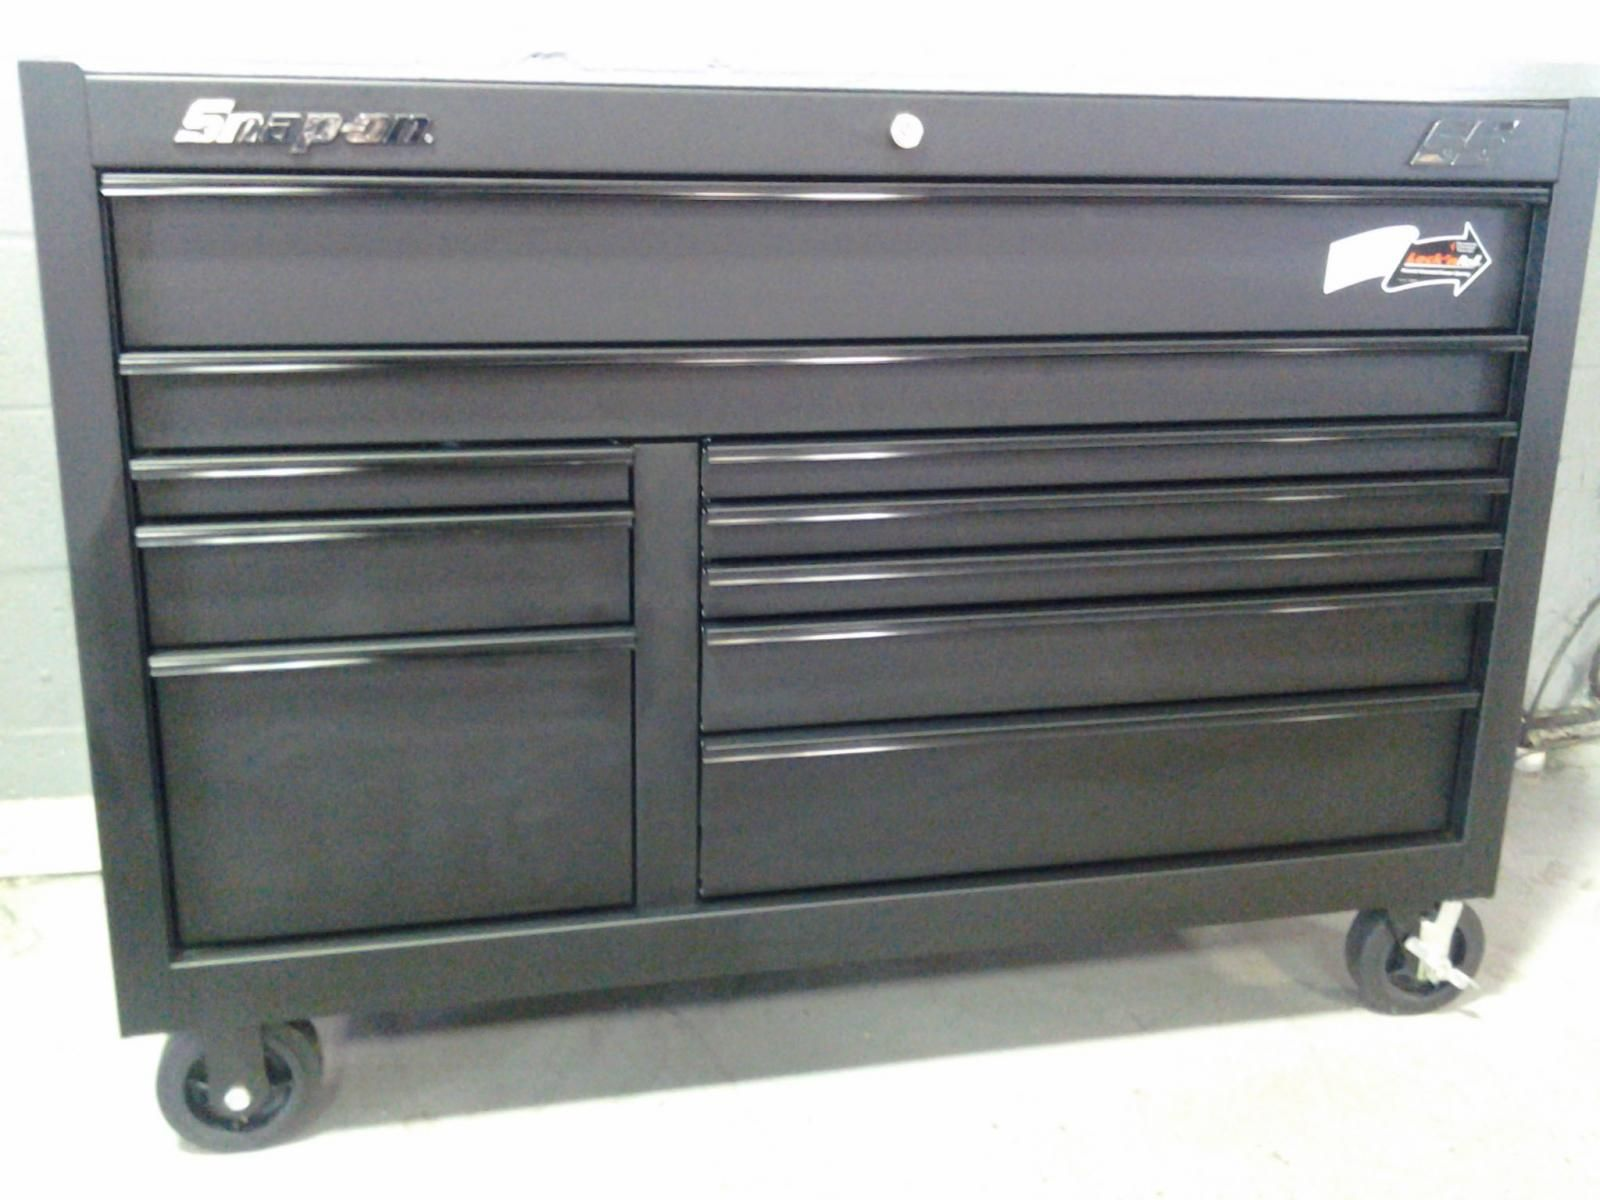 My Snap On Classic 78 Flat Black Tool Box Tool Box Storage Tool Box Tool Box Cabinet